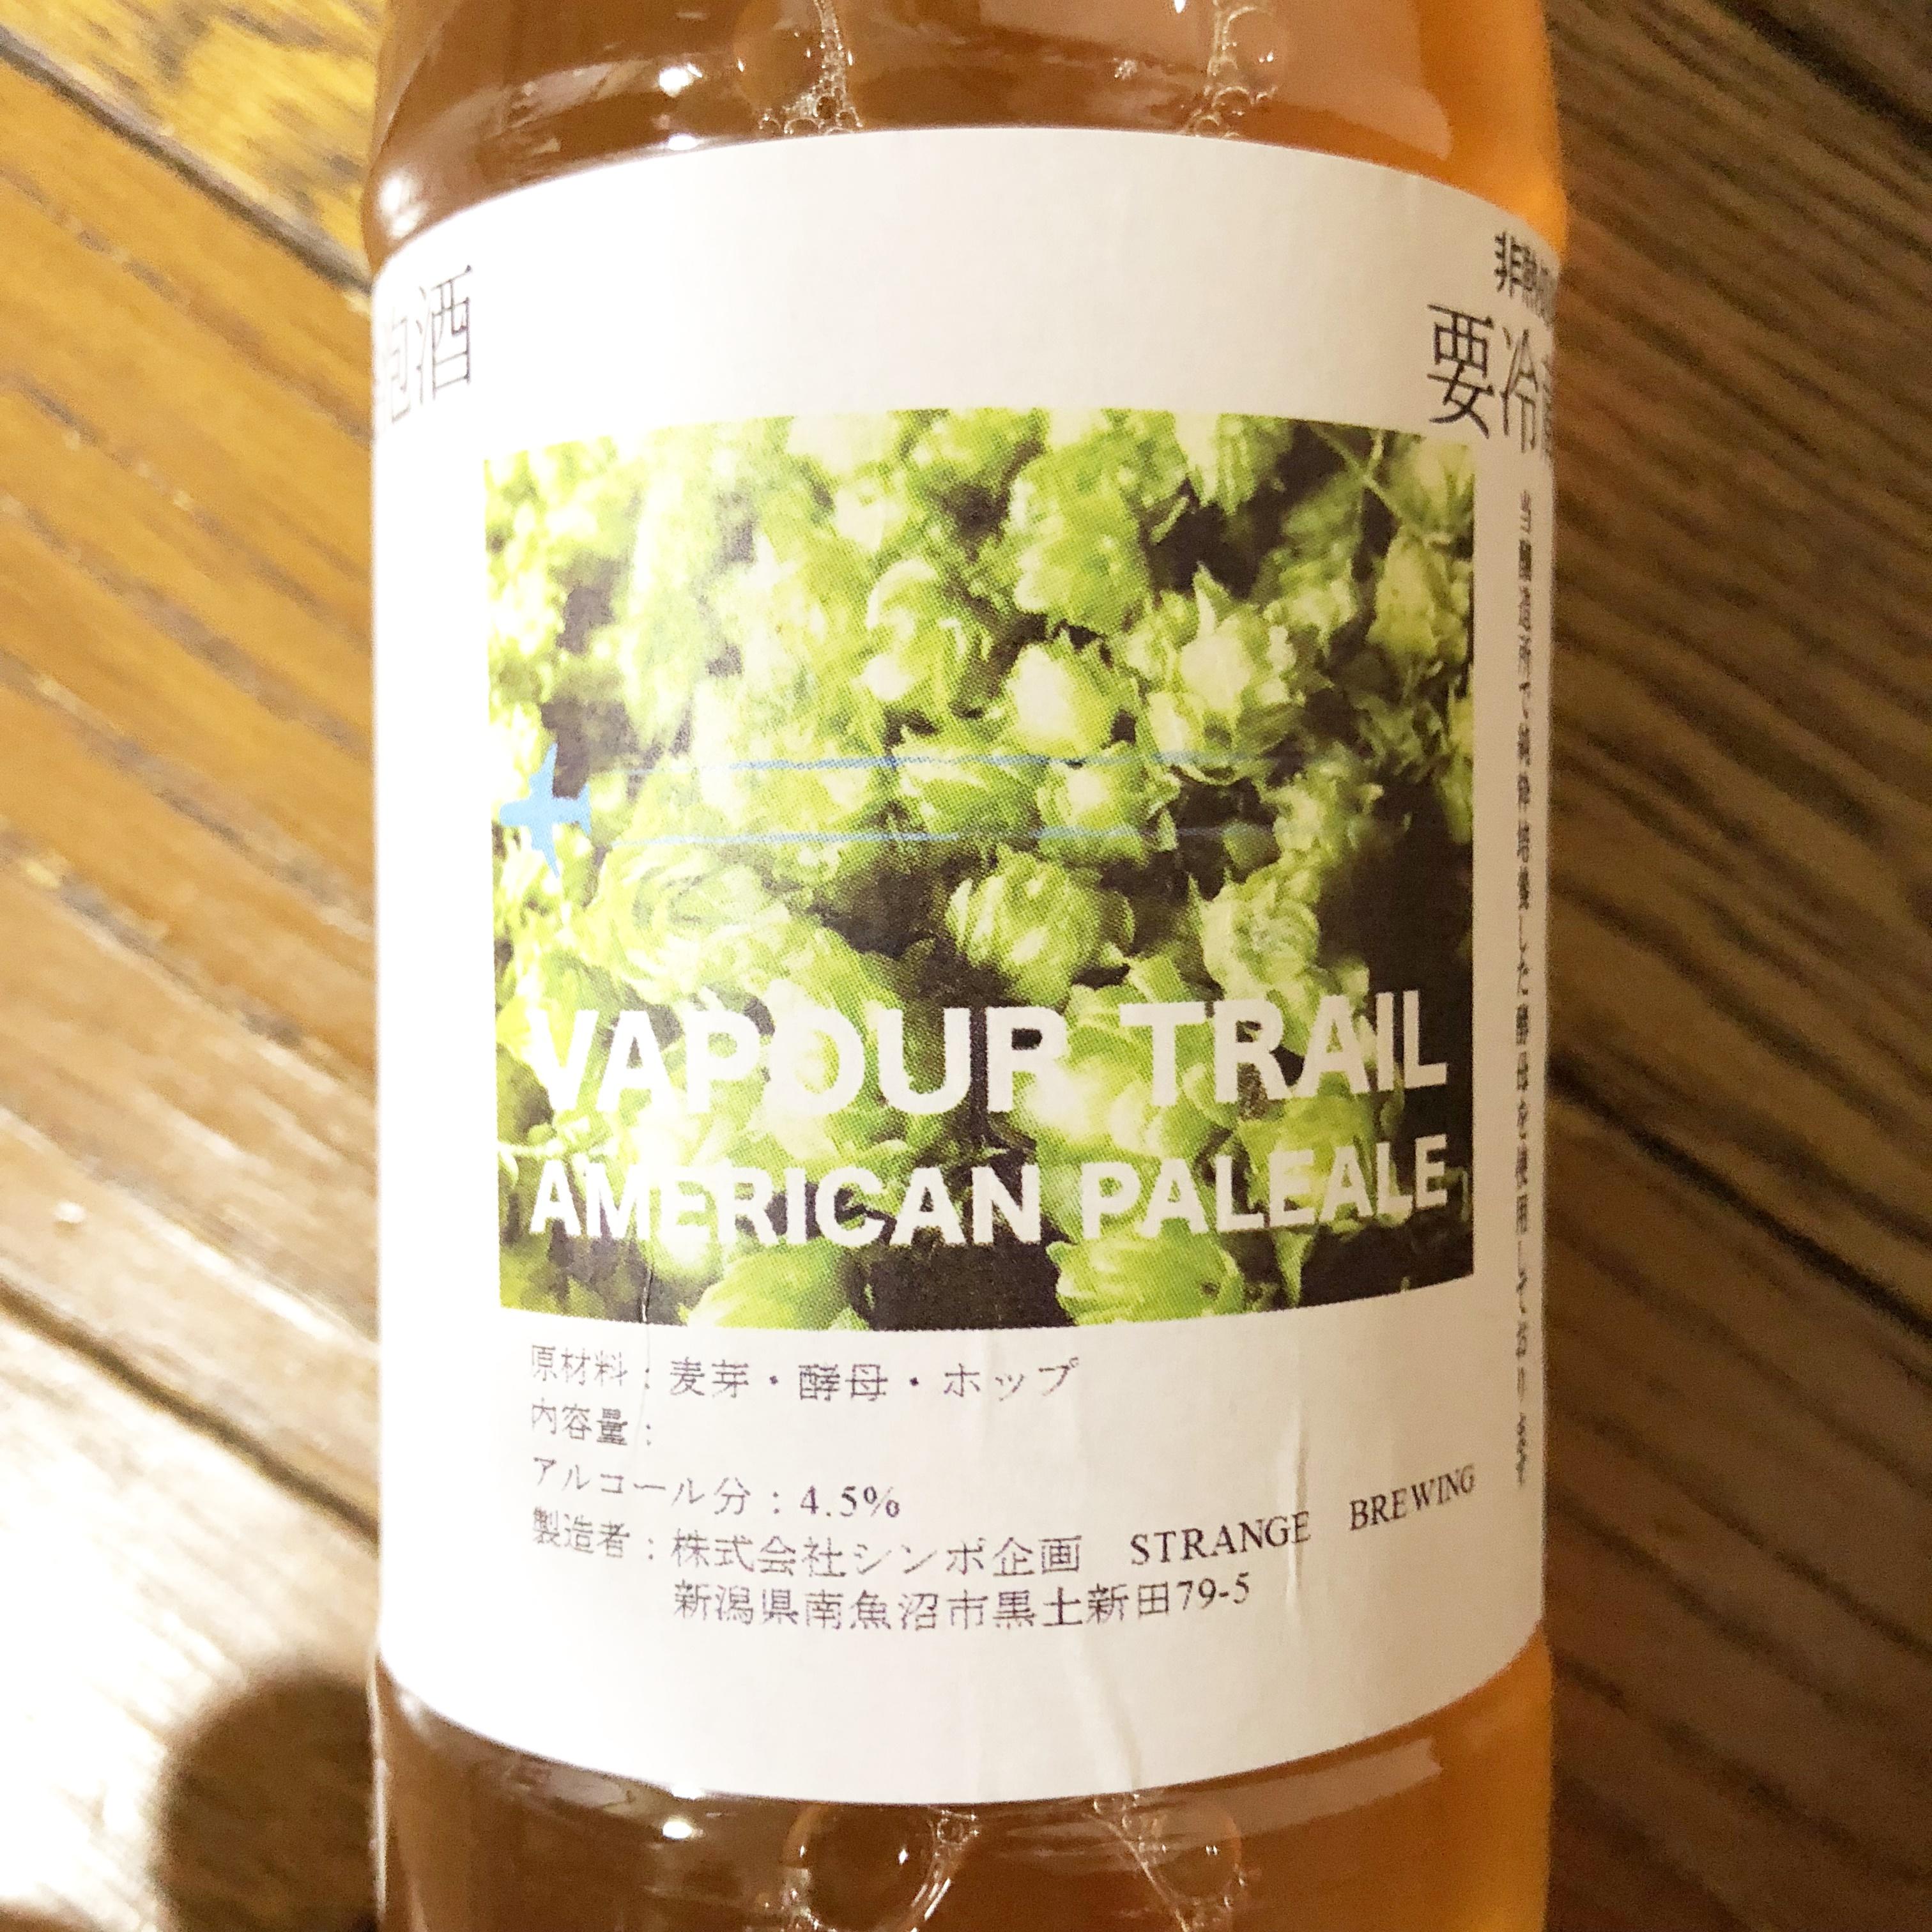 Strange Brewing【南魚沼】米どころのCraftBeer(地ビール)